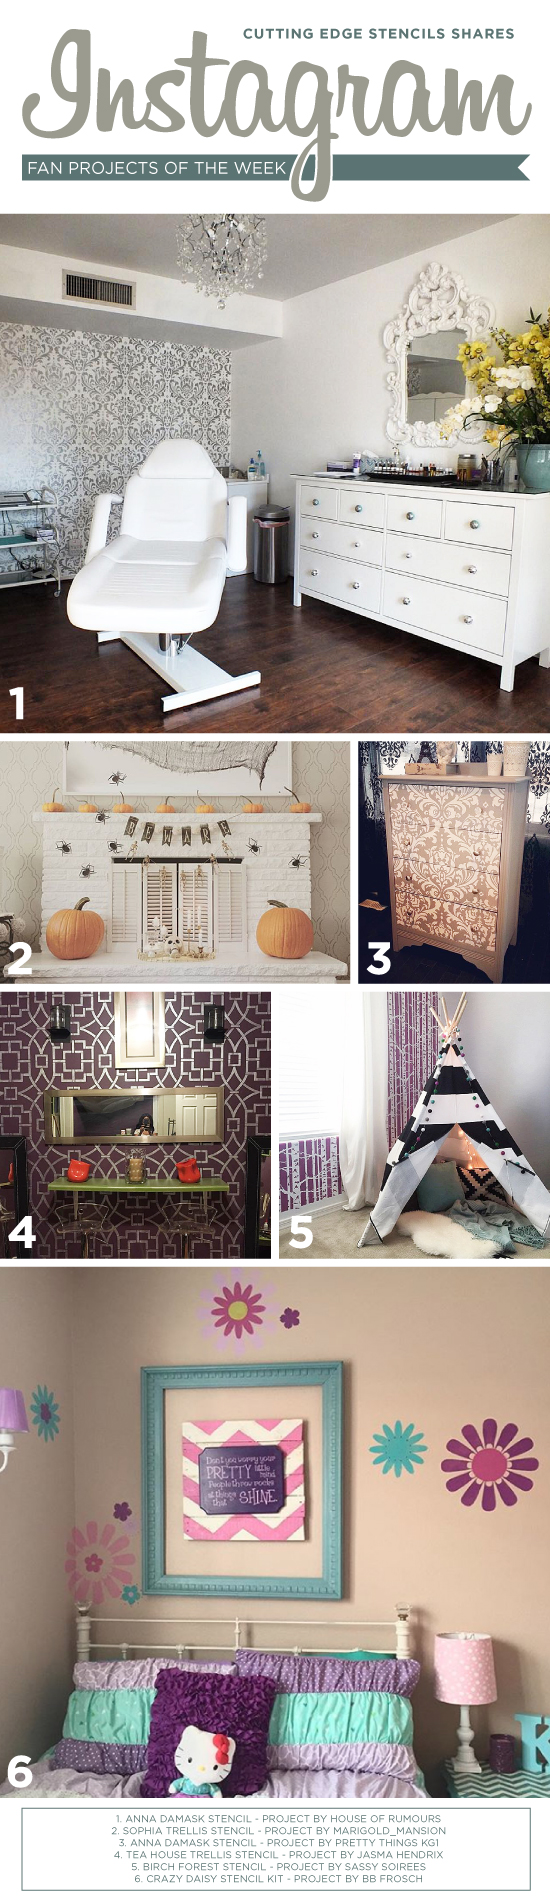 Cutting Edge Stencils shares DIY stenciled room and accent wall ideas featuring stencil patterns. http://www.cuttingedgestencils.com/wall-stencils-stencil-designs.html